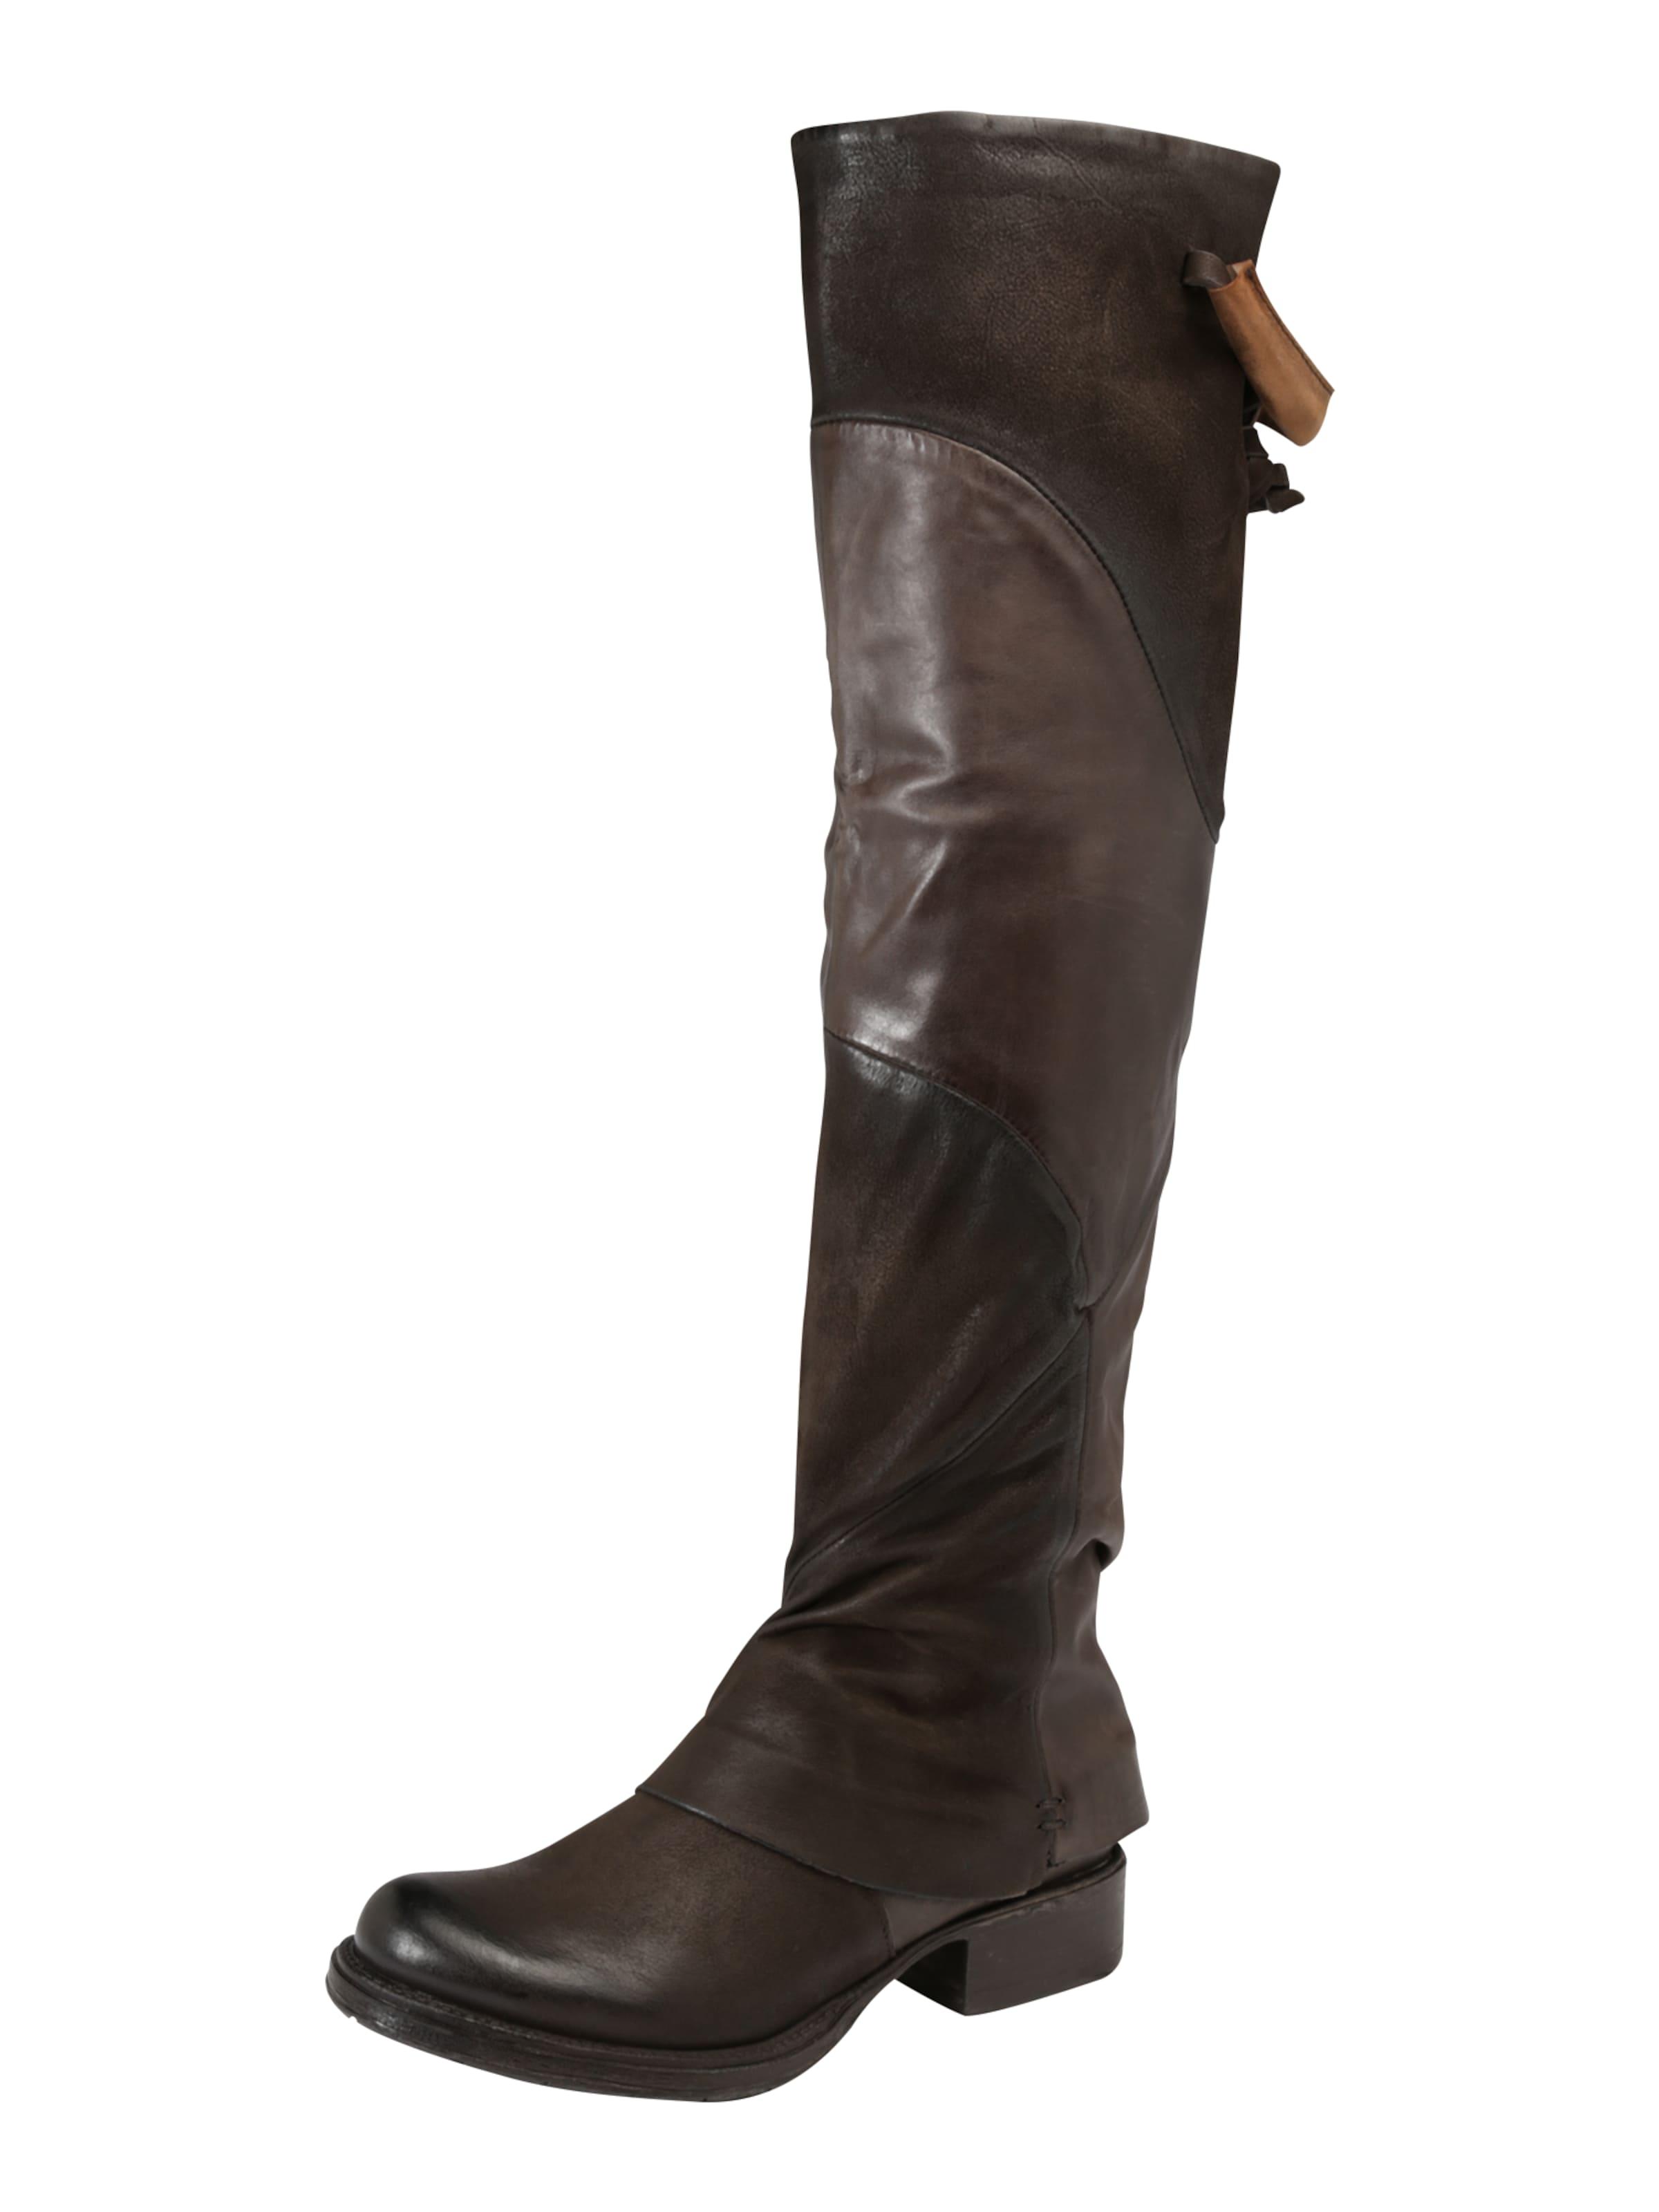 MJUS Overknee-Stiefel Günstige und langlebige Schuhe